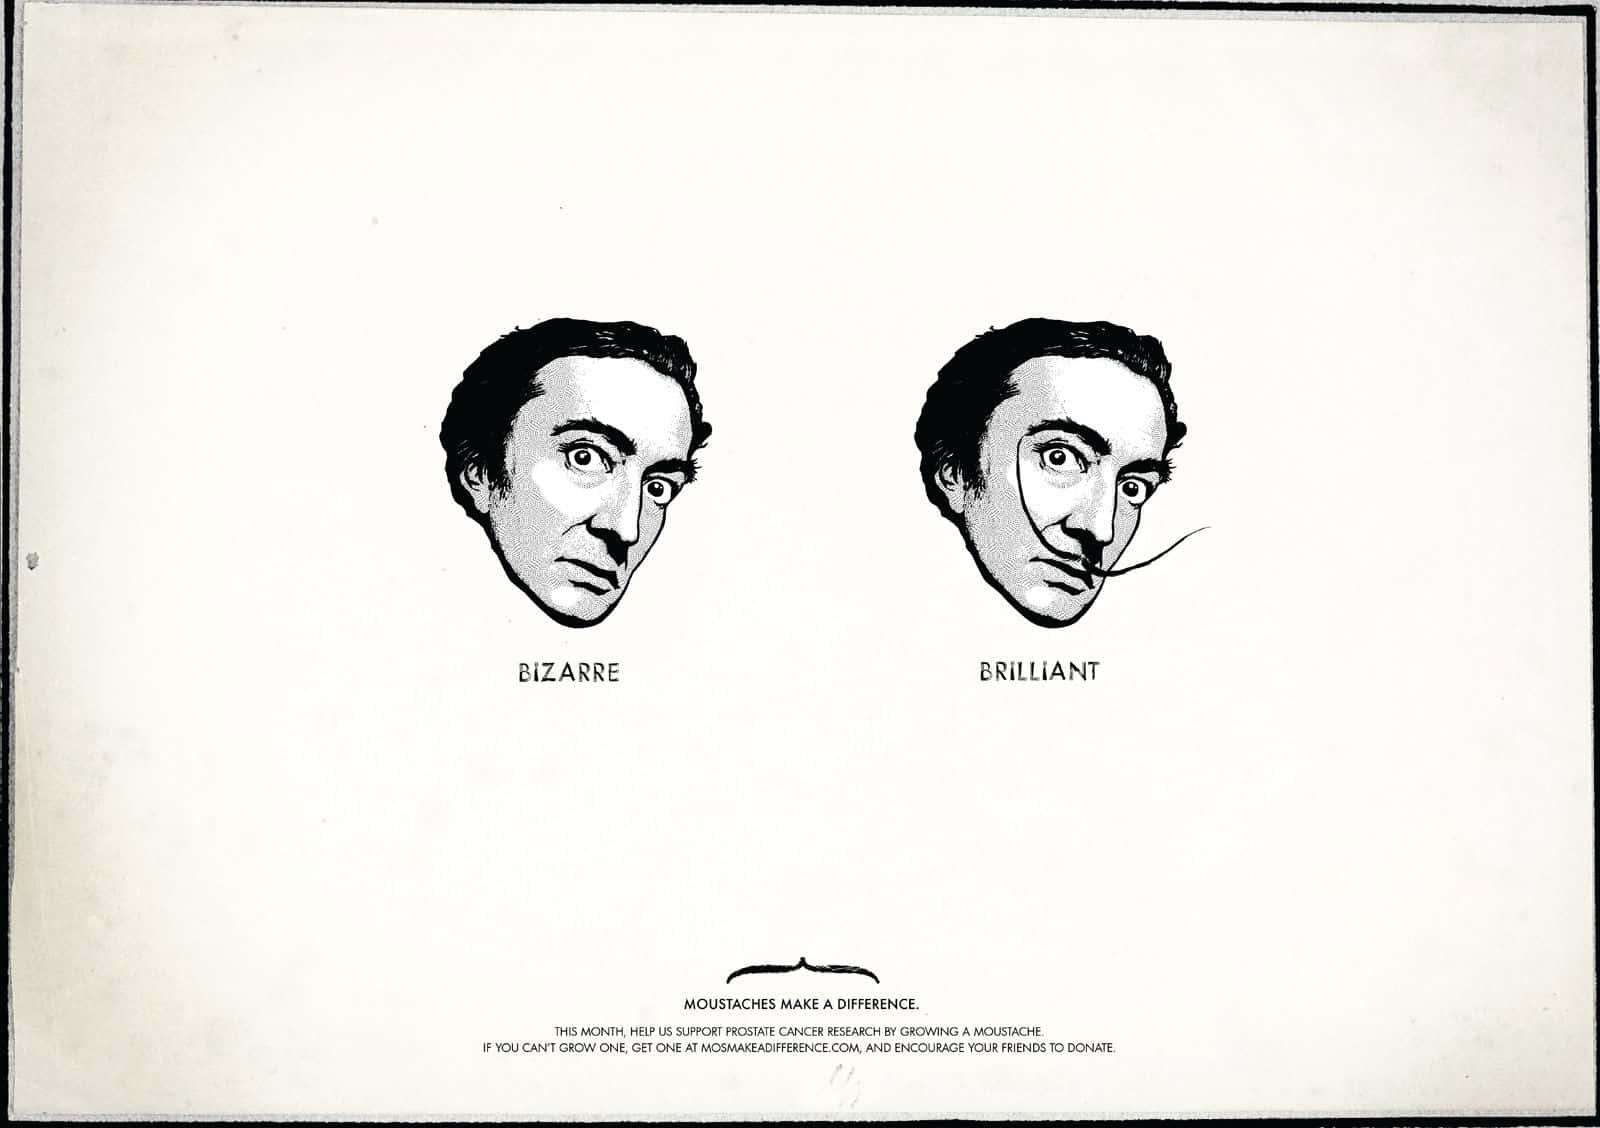 Moustaches-Make-A-Difference-Salvado-Dali